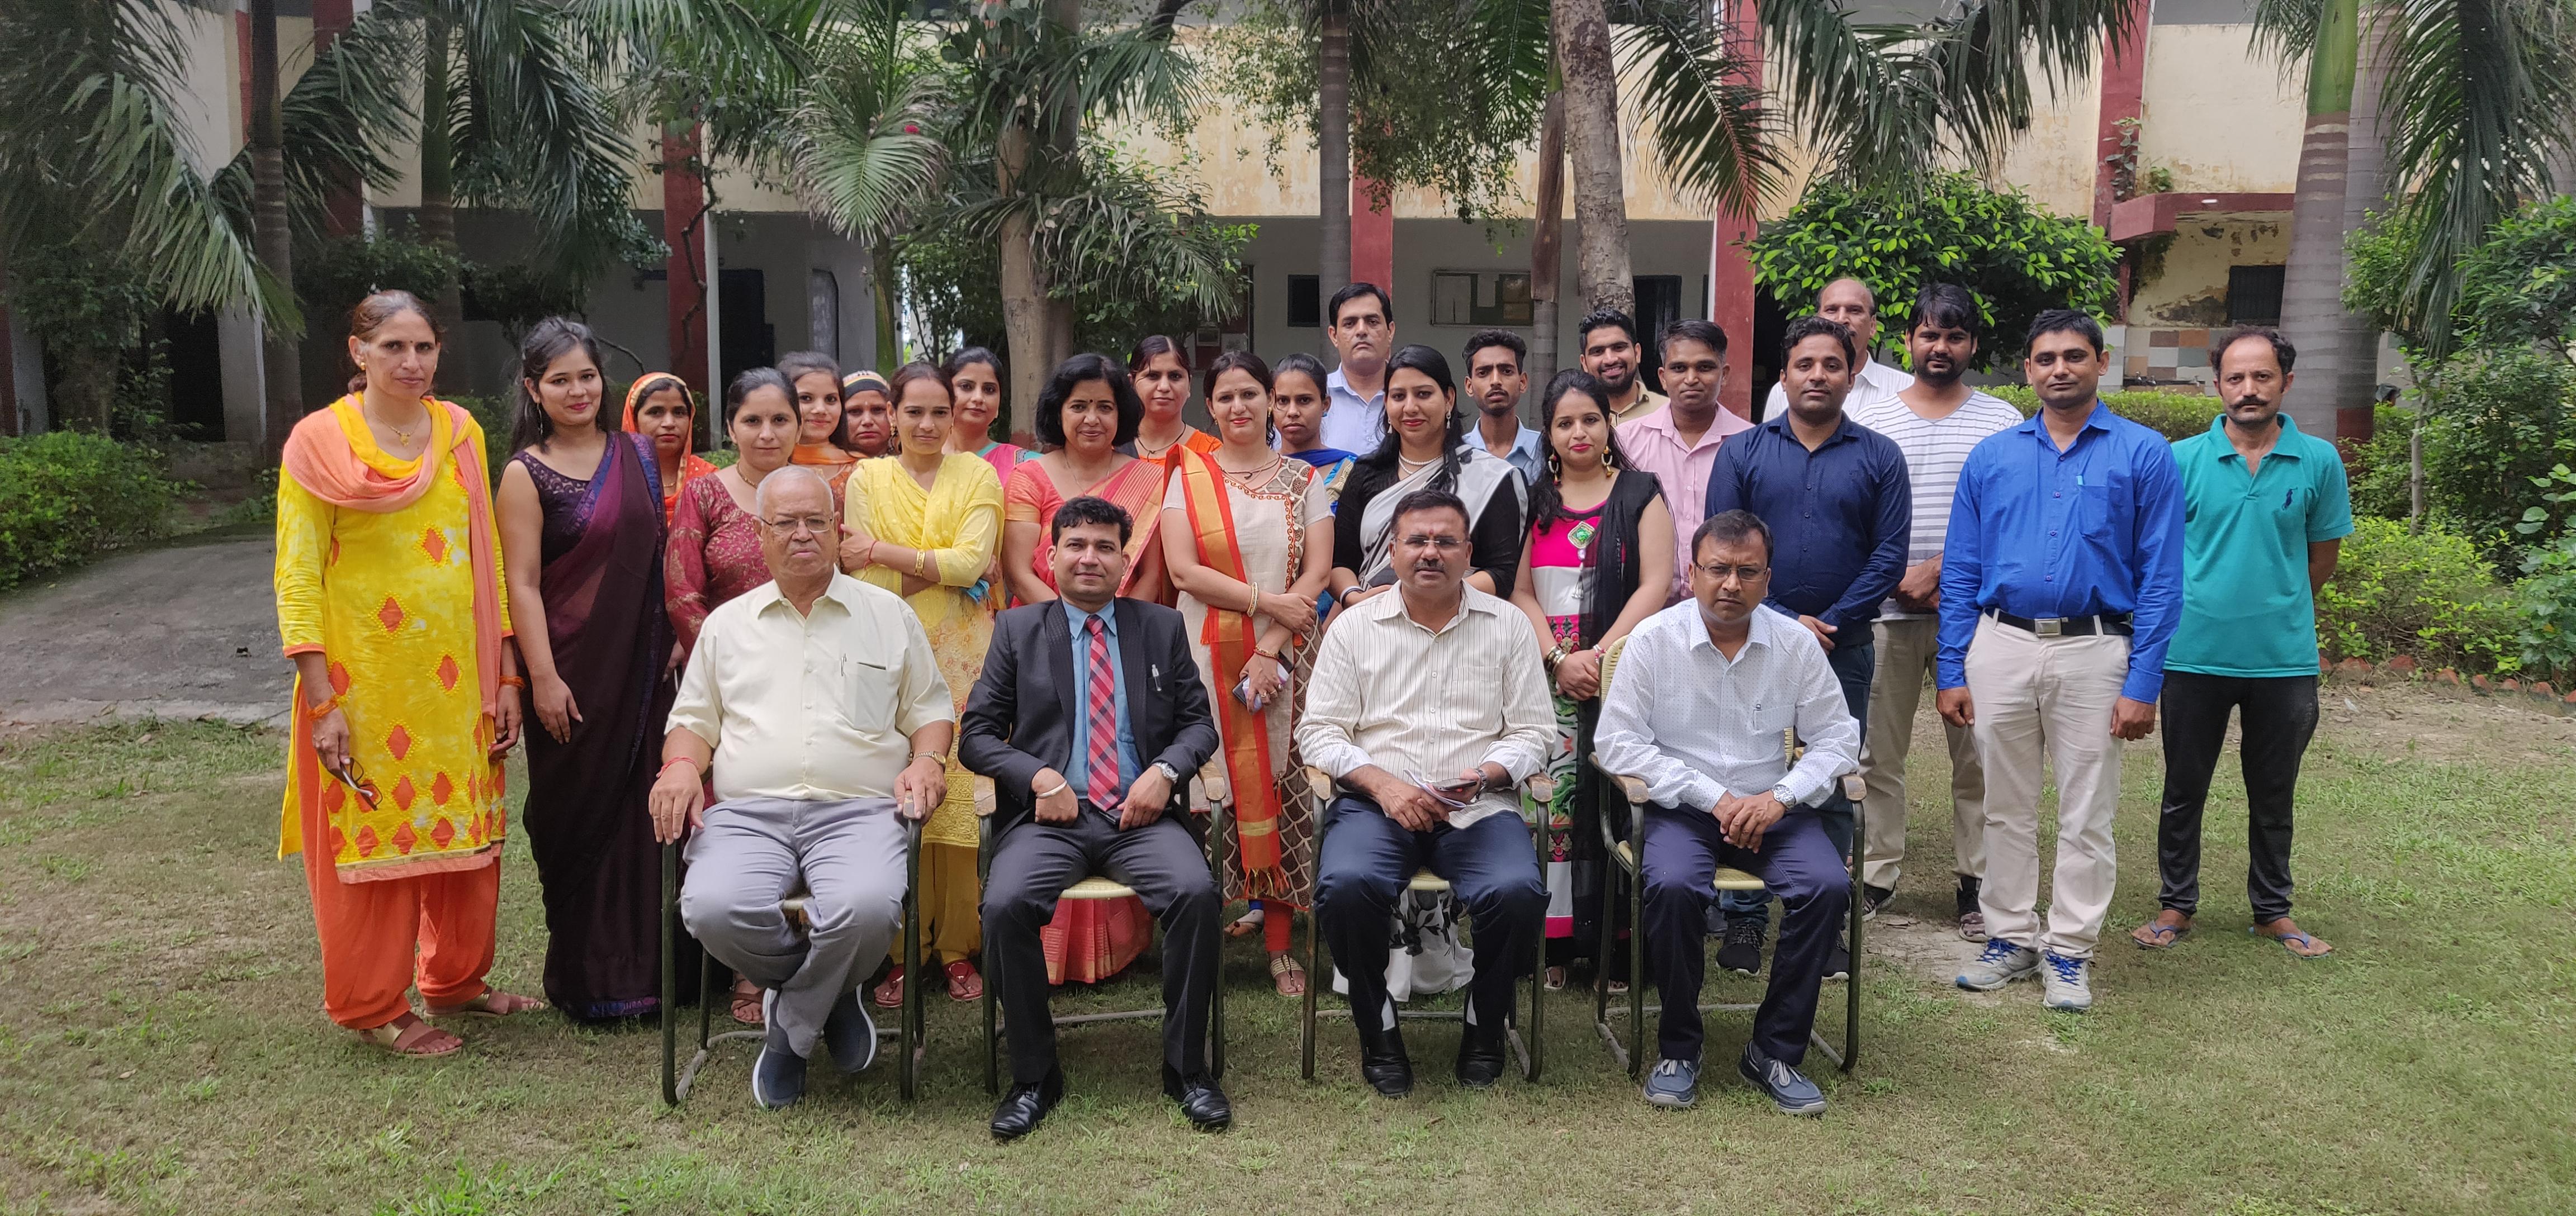 Orientation Day and Havan puja at Venkteshwara College of Education